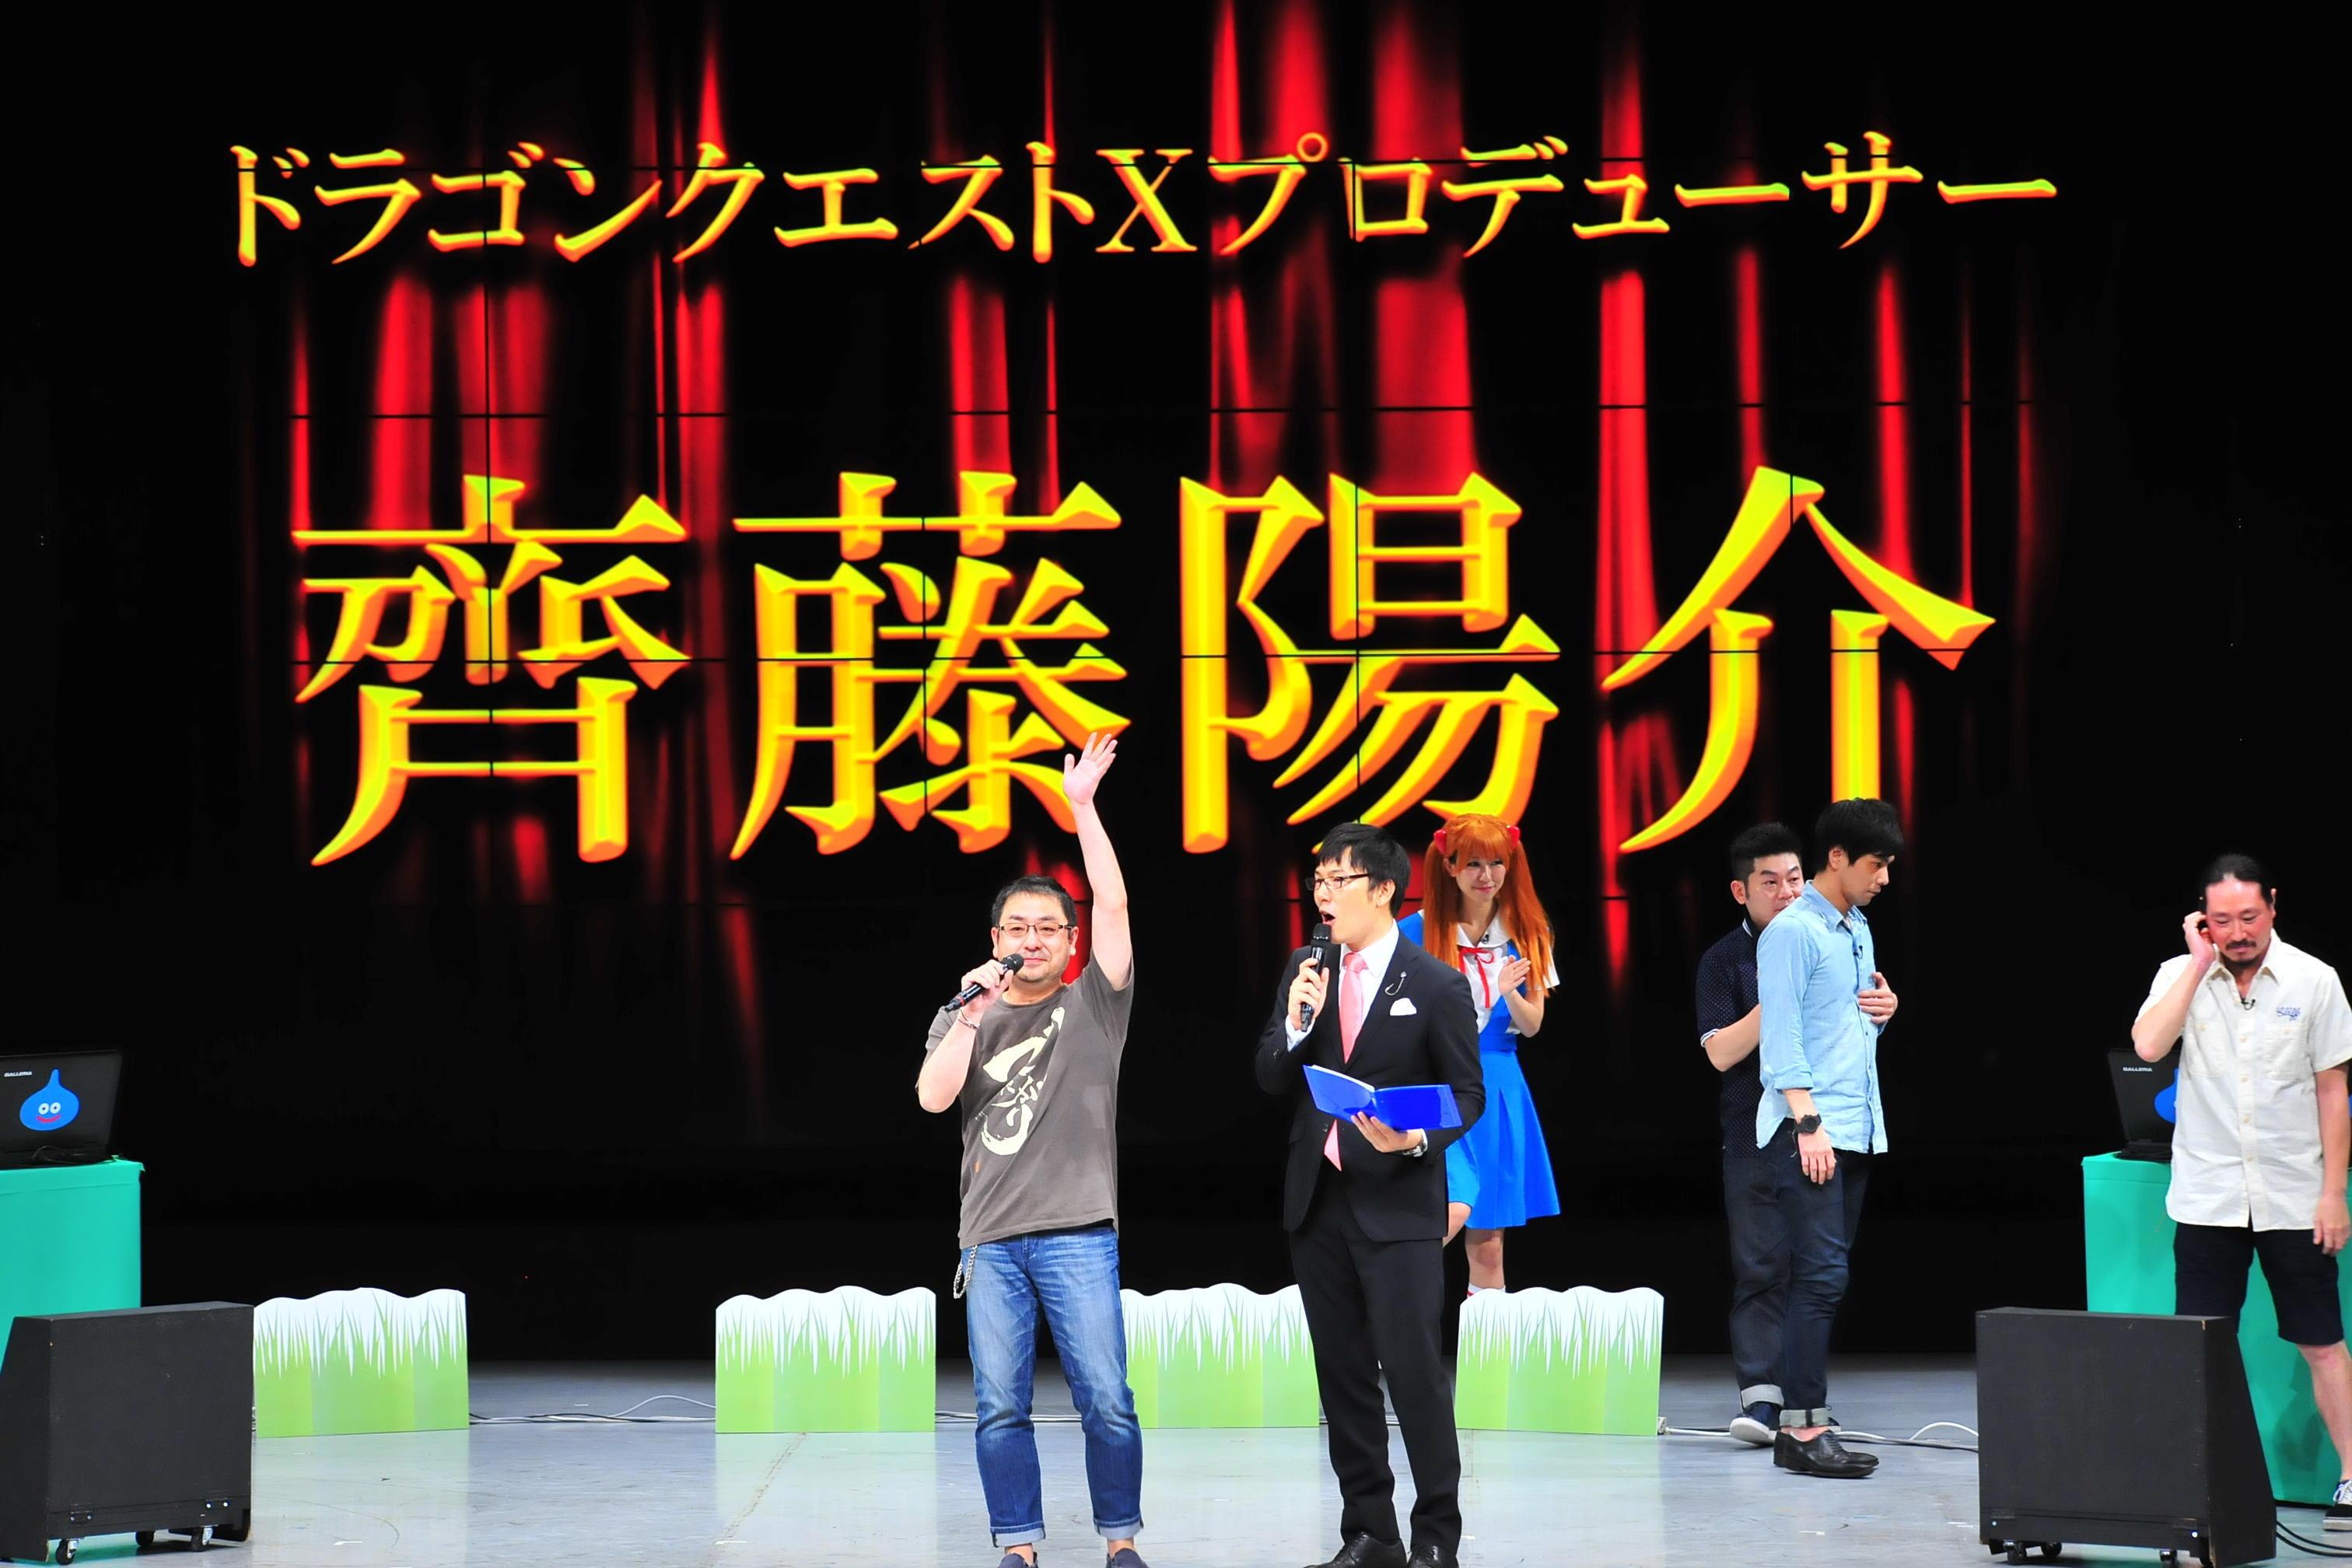 http://news.yoshimoto.co.jp/20160613094737-d83b8c25e5253548bcd175f399de5fedc80eb2ee.jpg